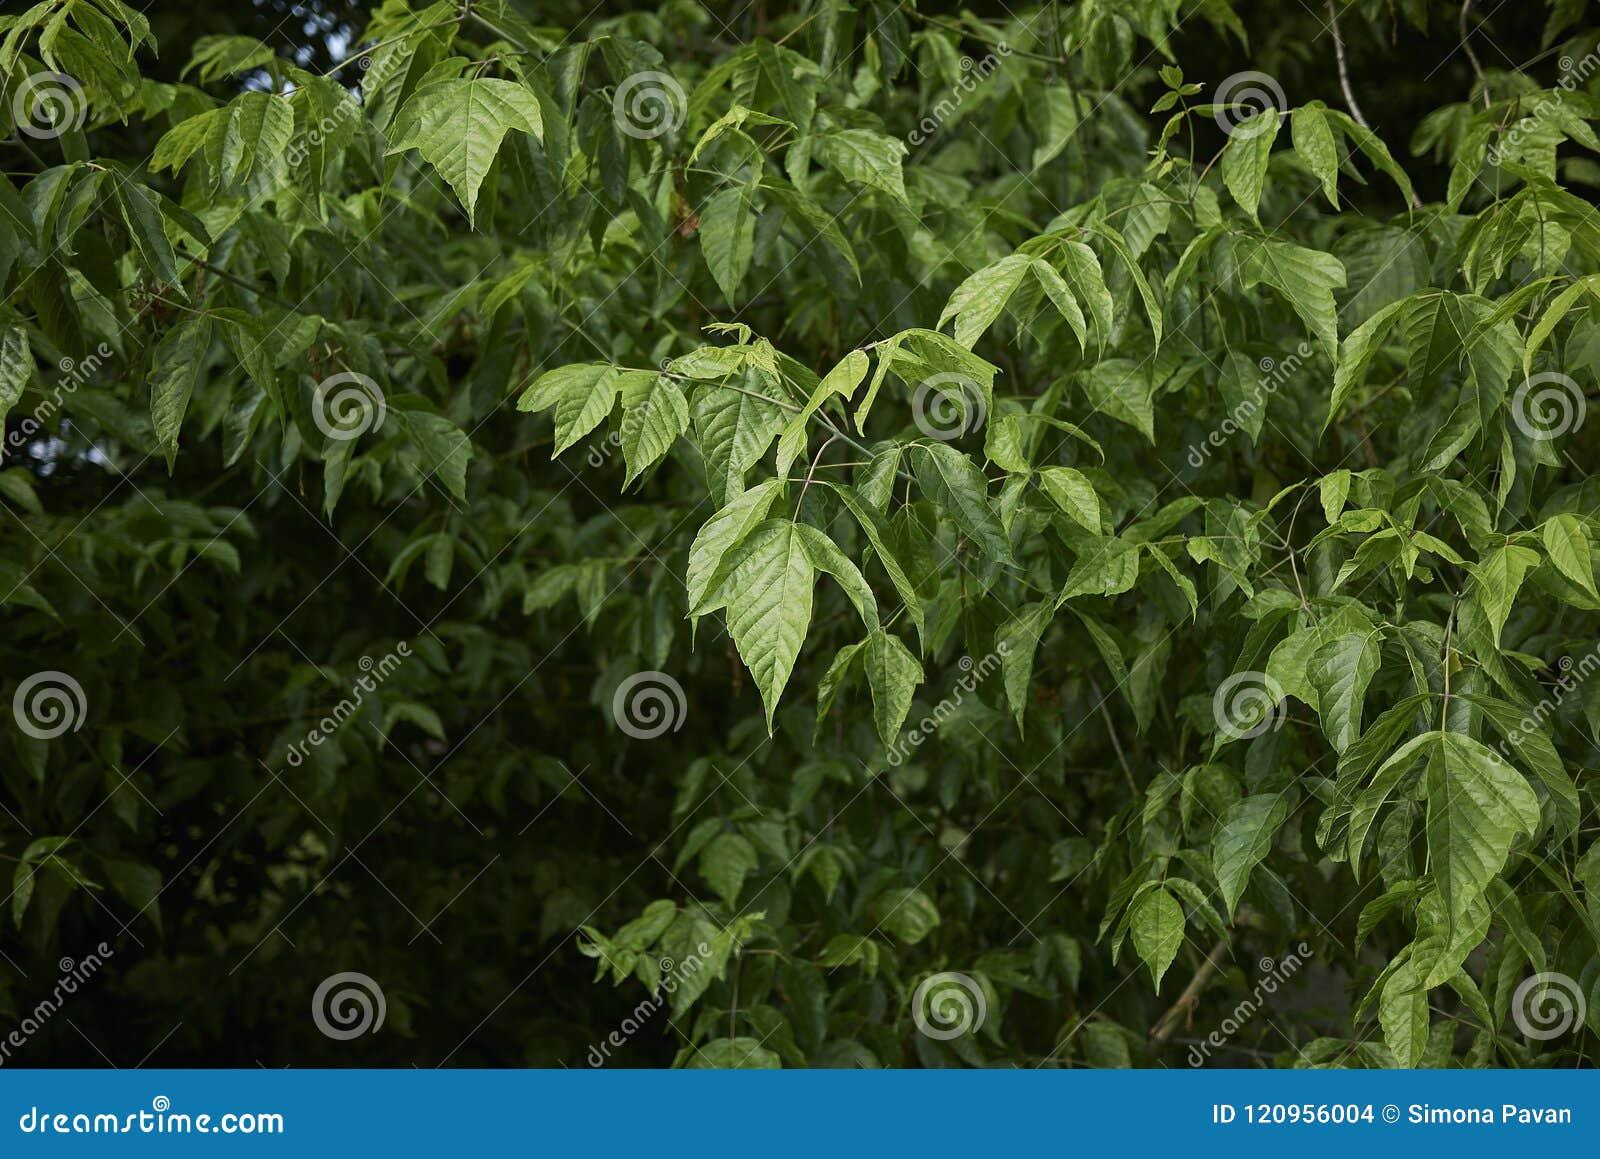 Leaves Of Acer Negundo Tree Stock Photo Image Of Plant Spring